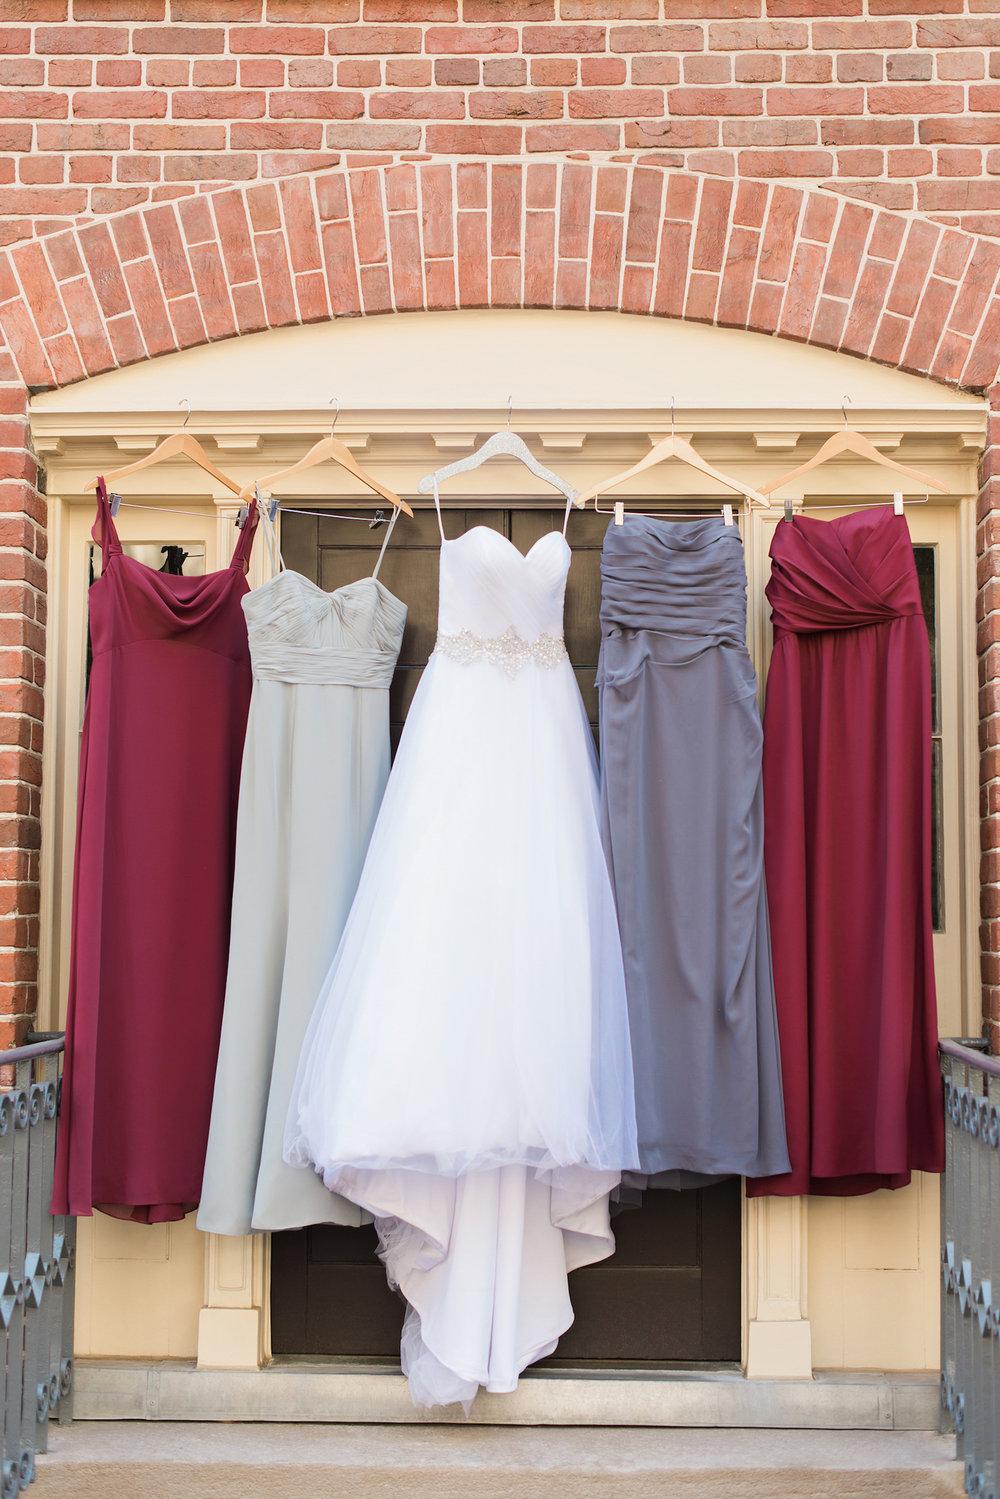 romantic-vintage-wedding-urban-venue-wedding-party-dresses.jpg